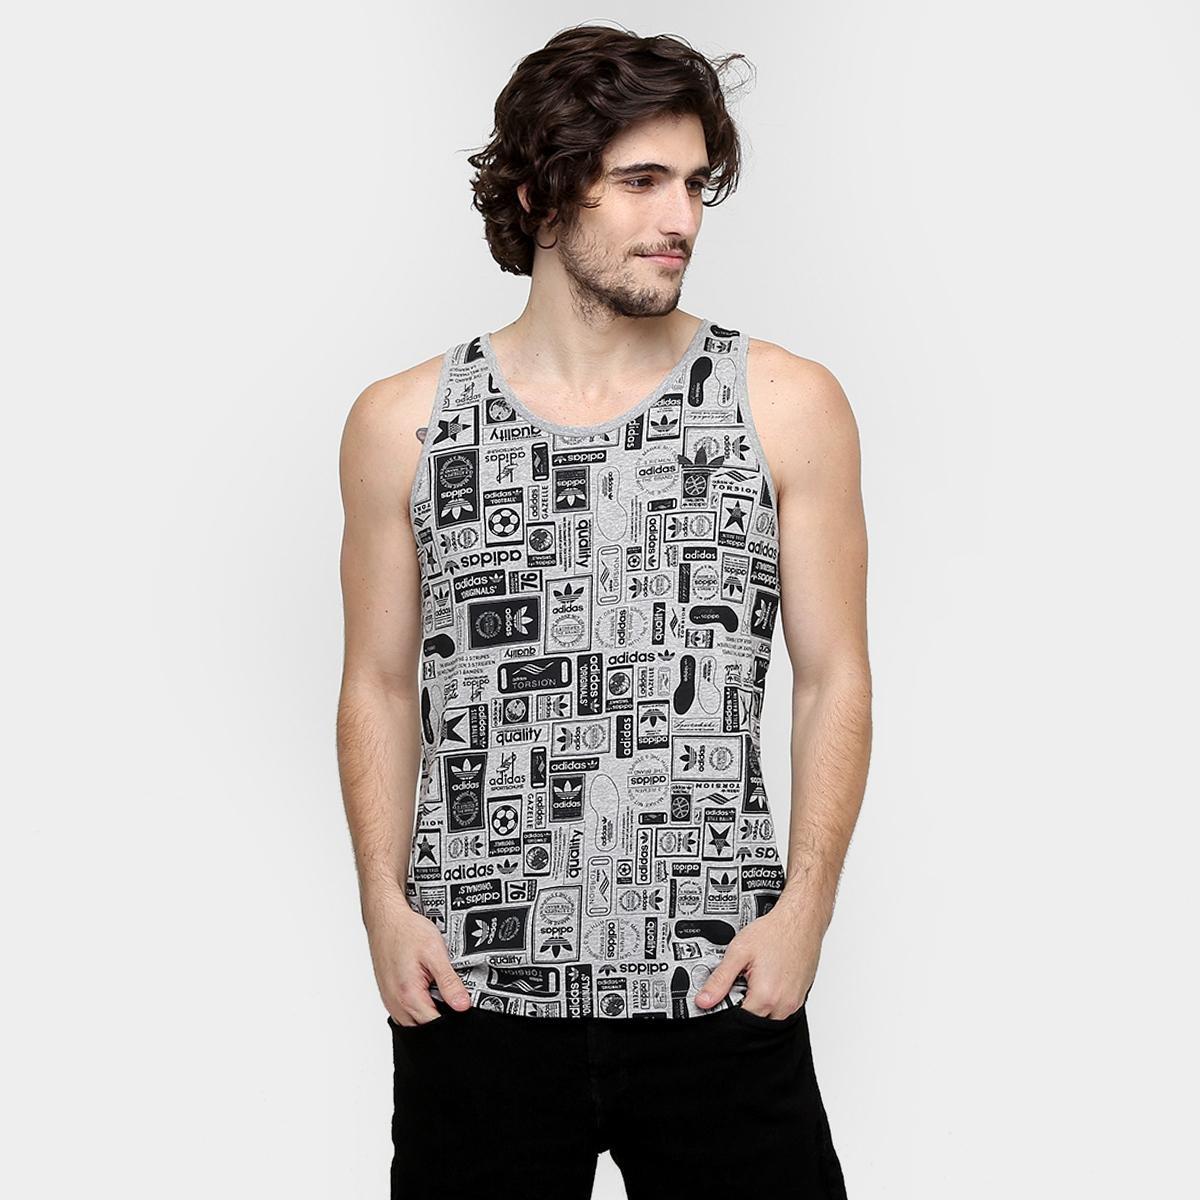 9b78c69270c Camiseta Regata Adidas Street Grp Aop - Compre Agora